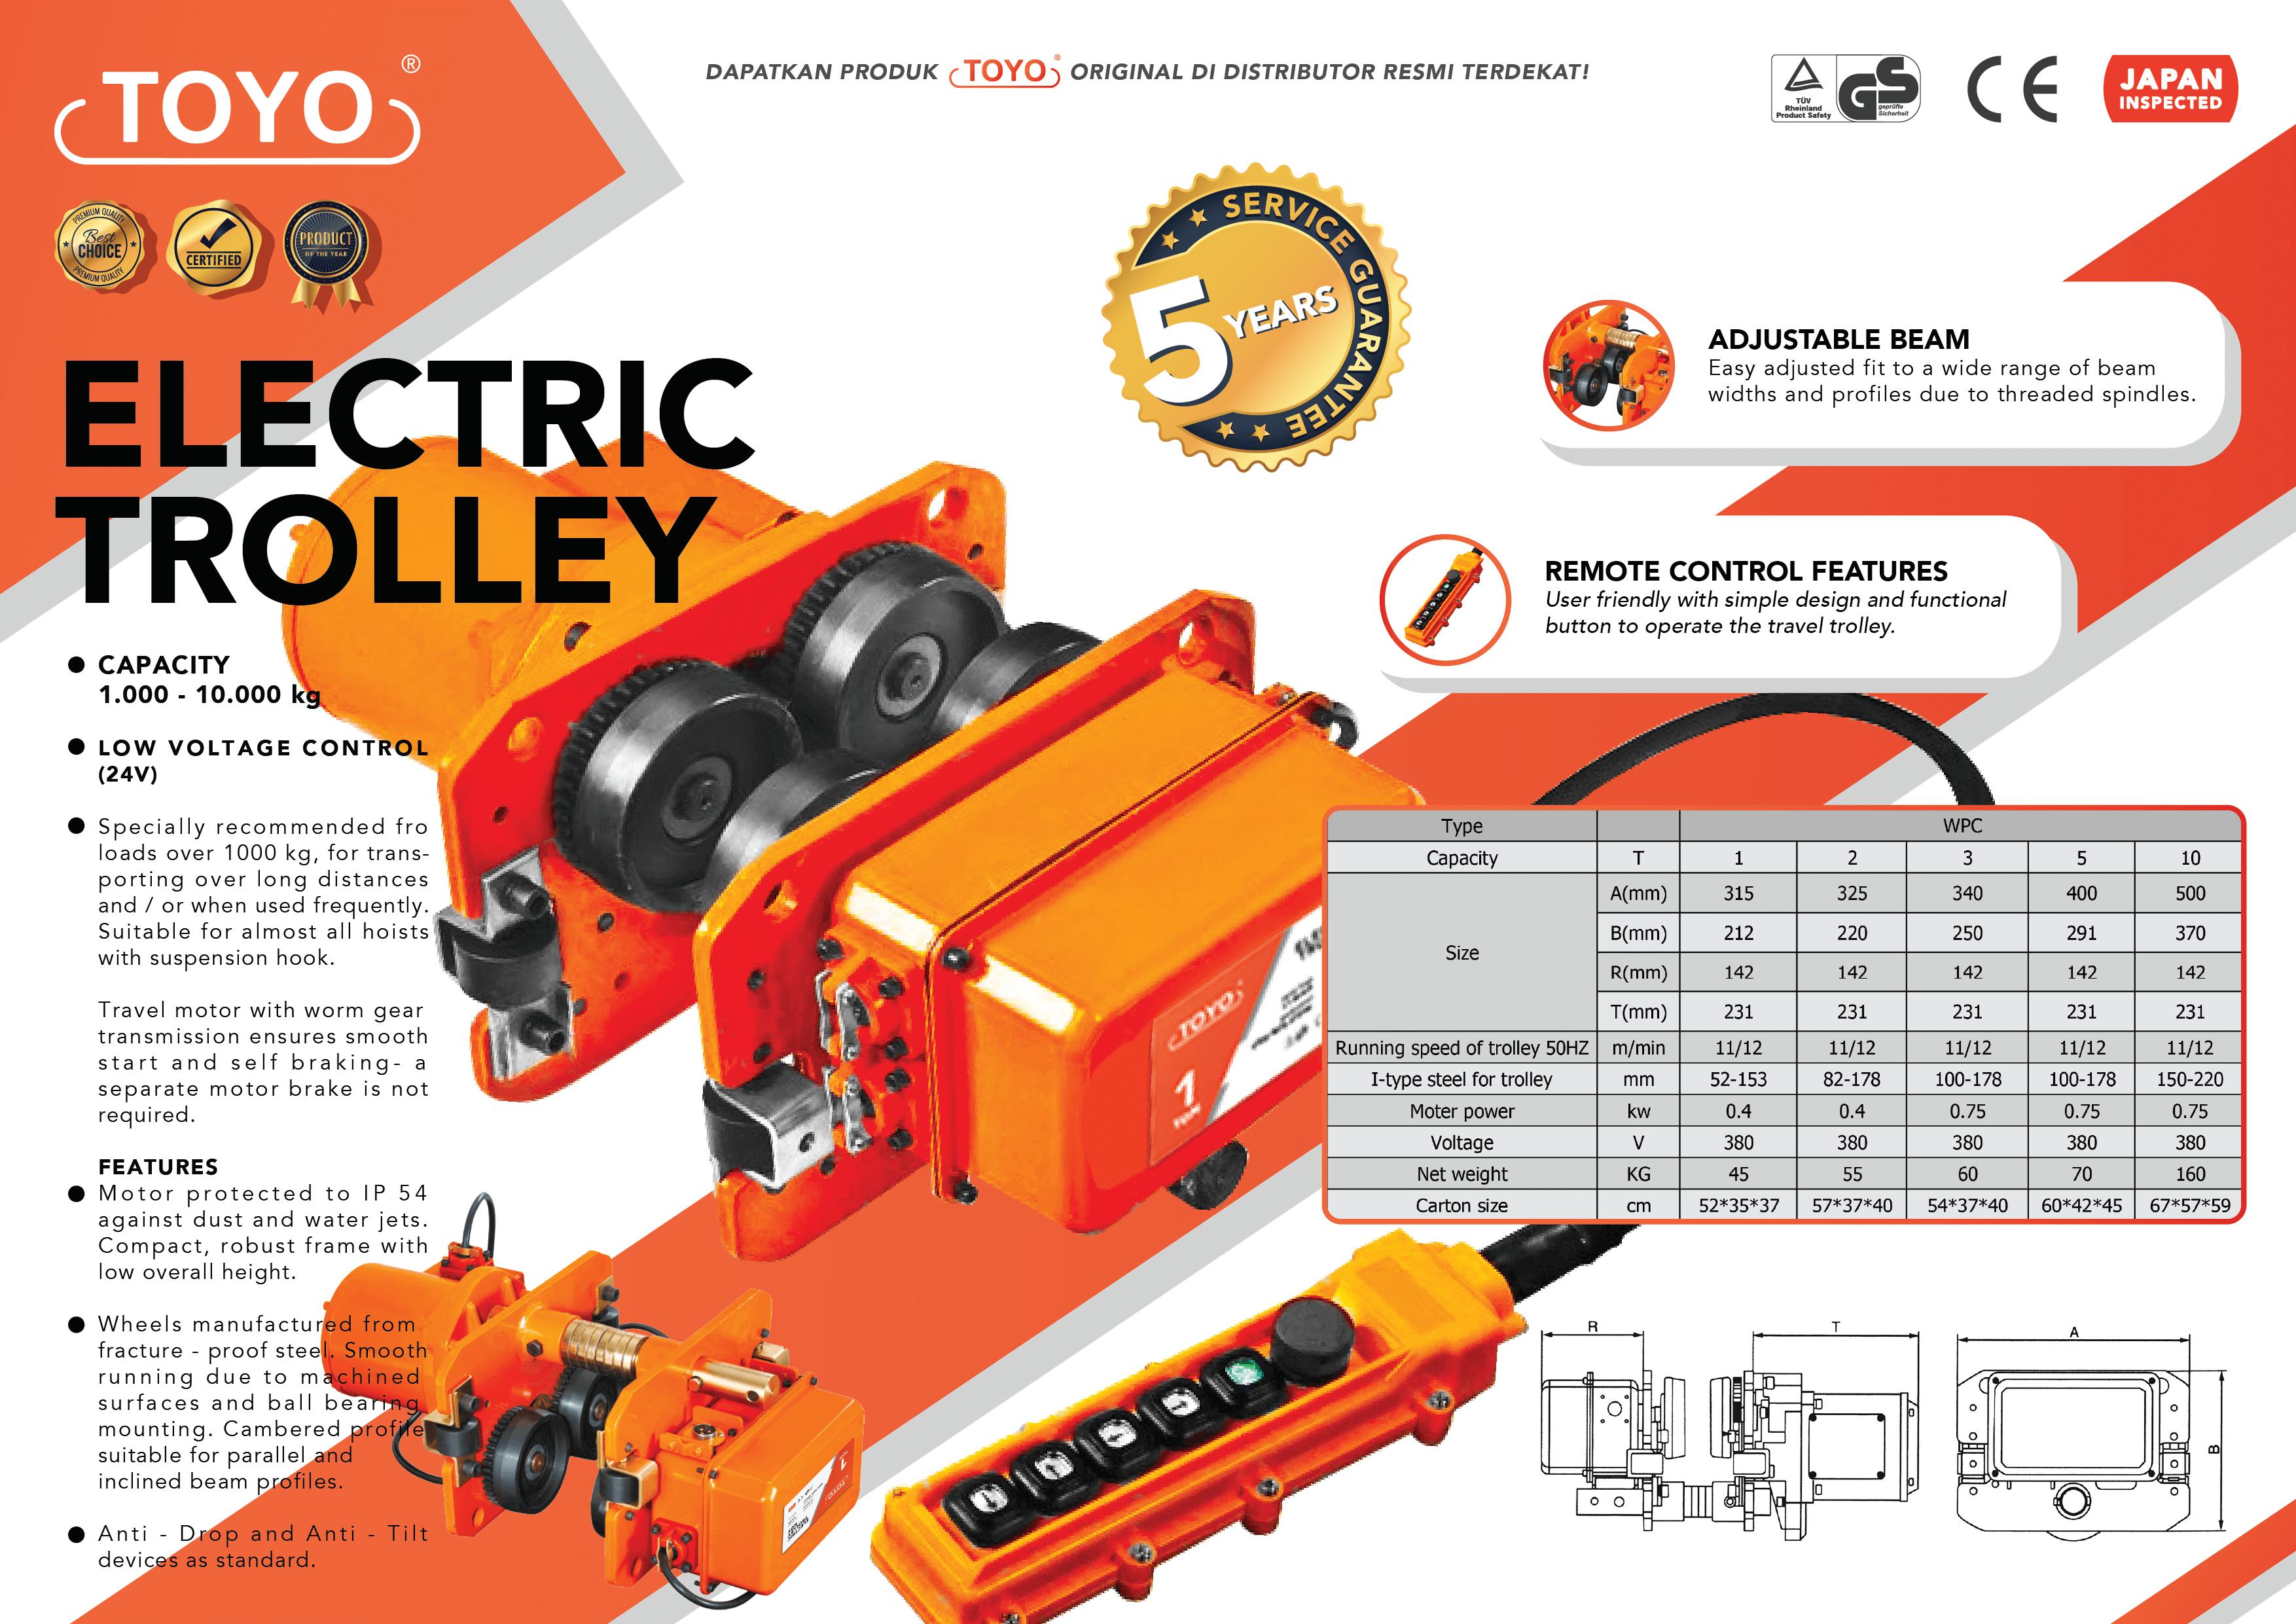 Spesifikasi Detail Electric Trolley Toyo Original